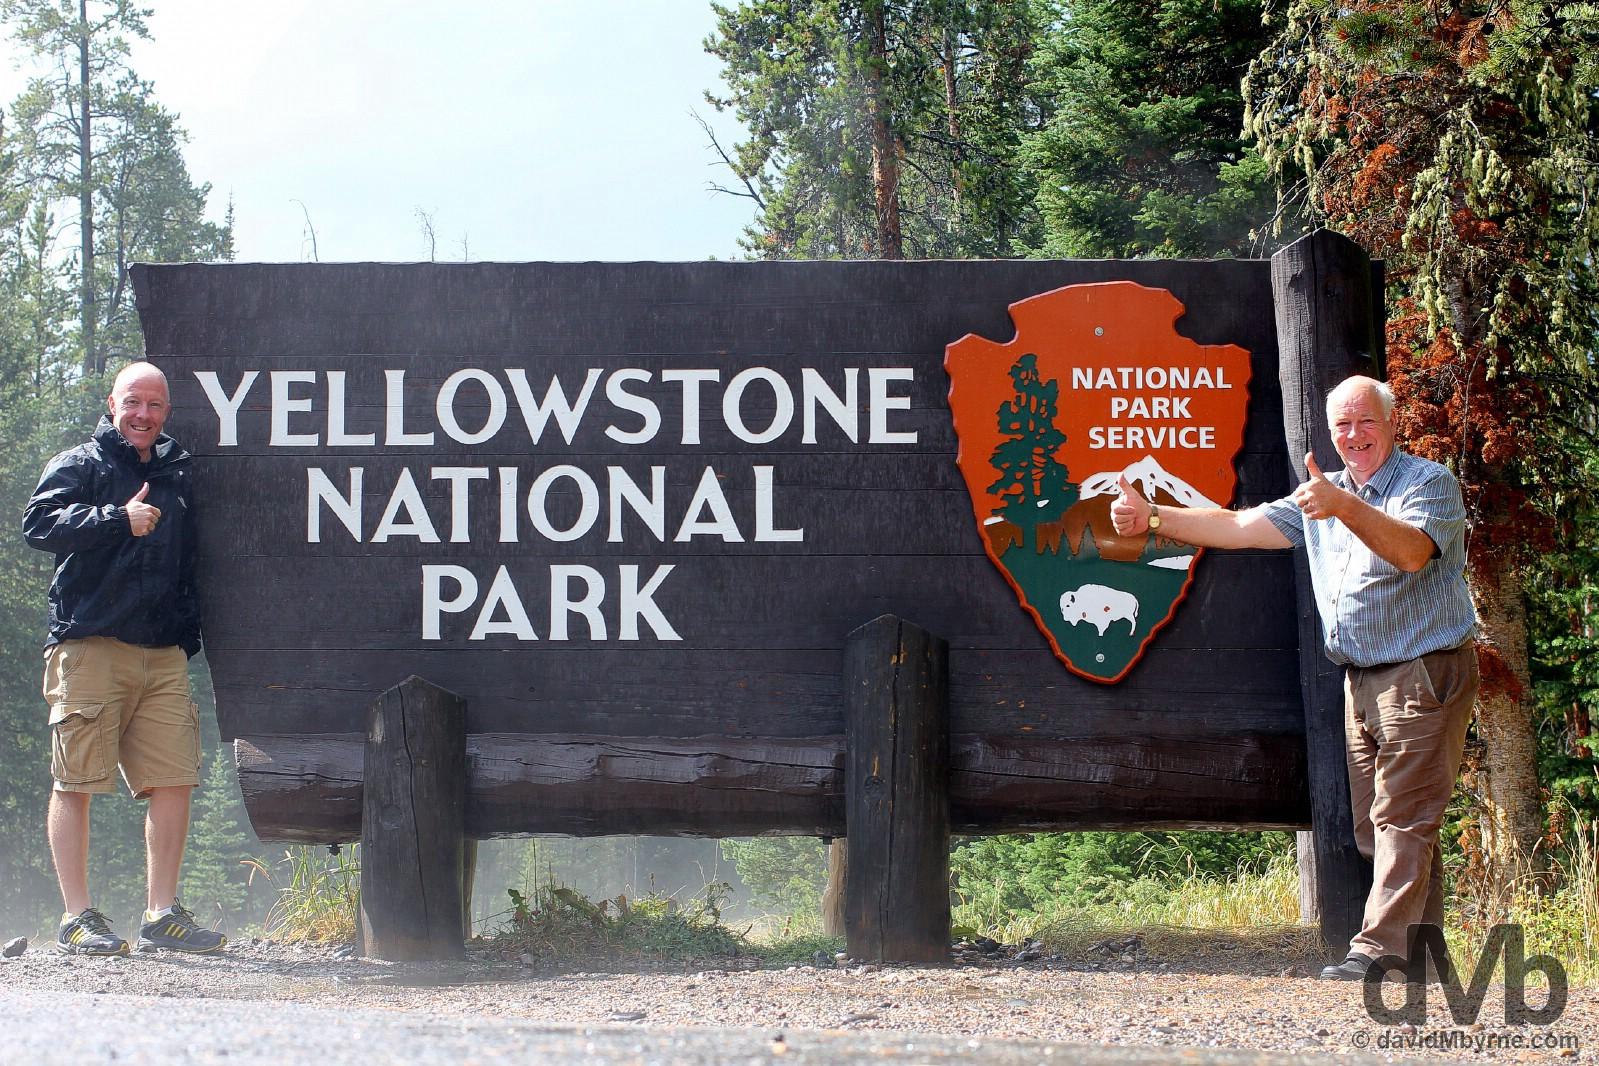 Entering Yellowstone National park, USA. September 4, 2016.